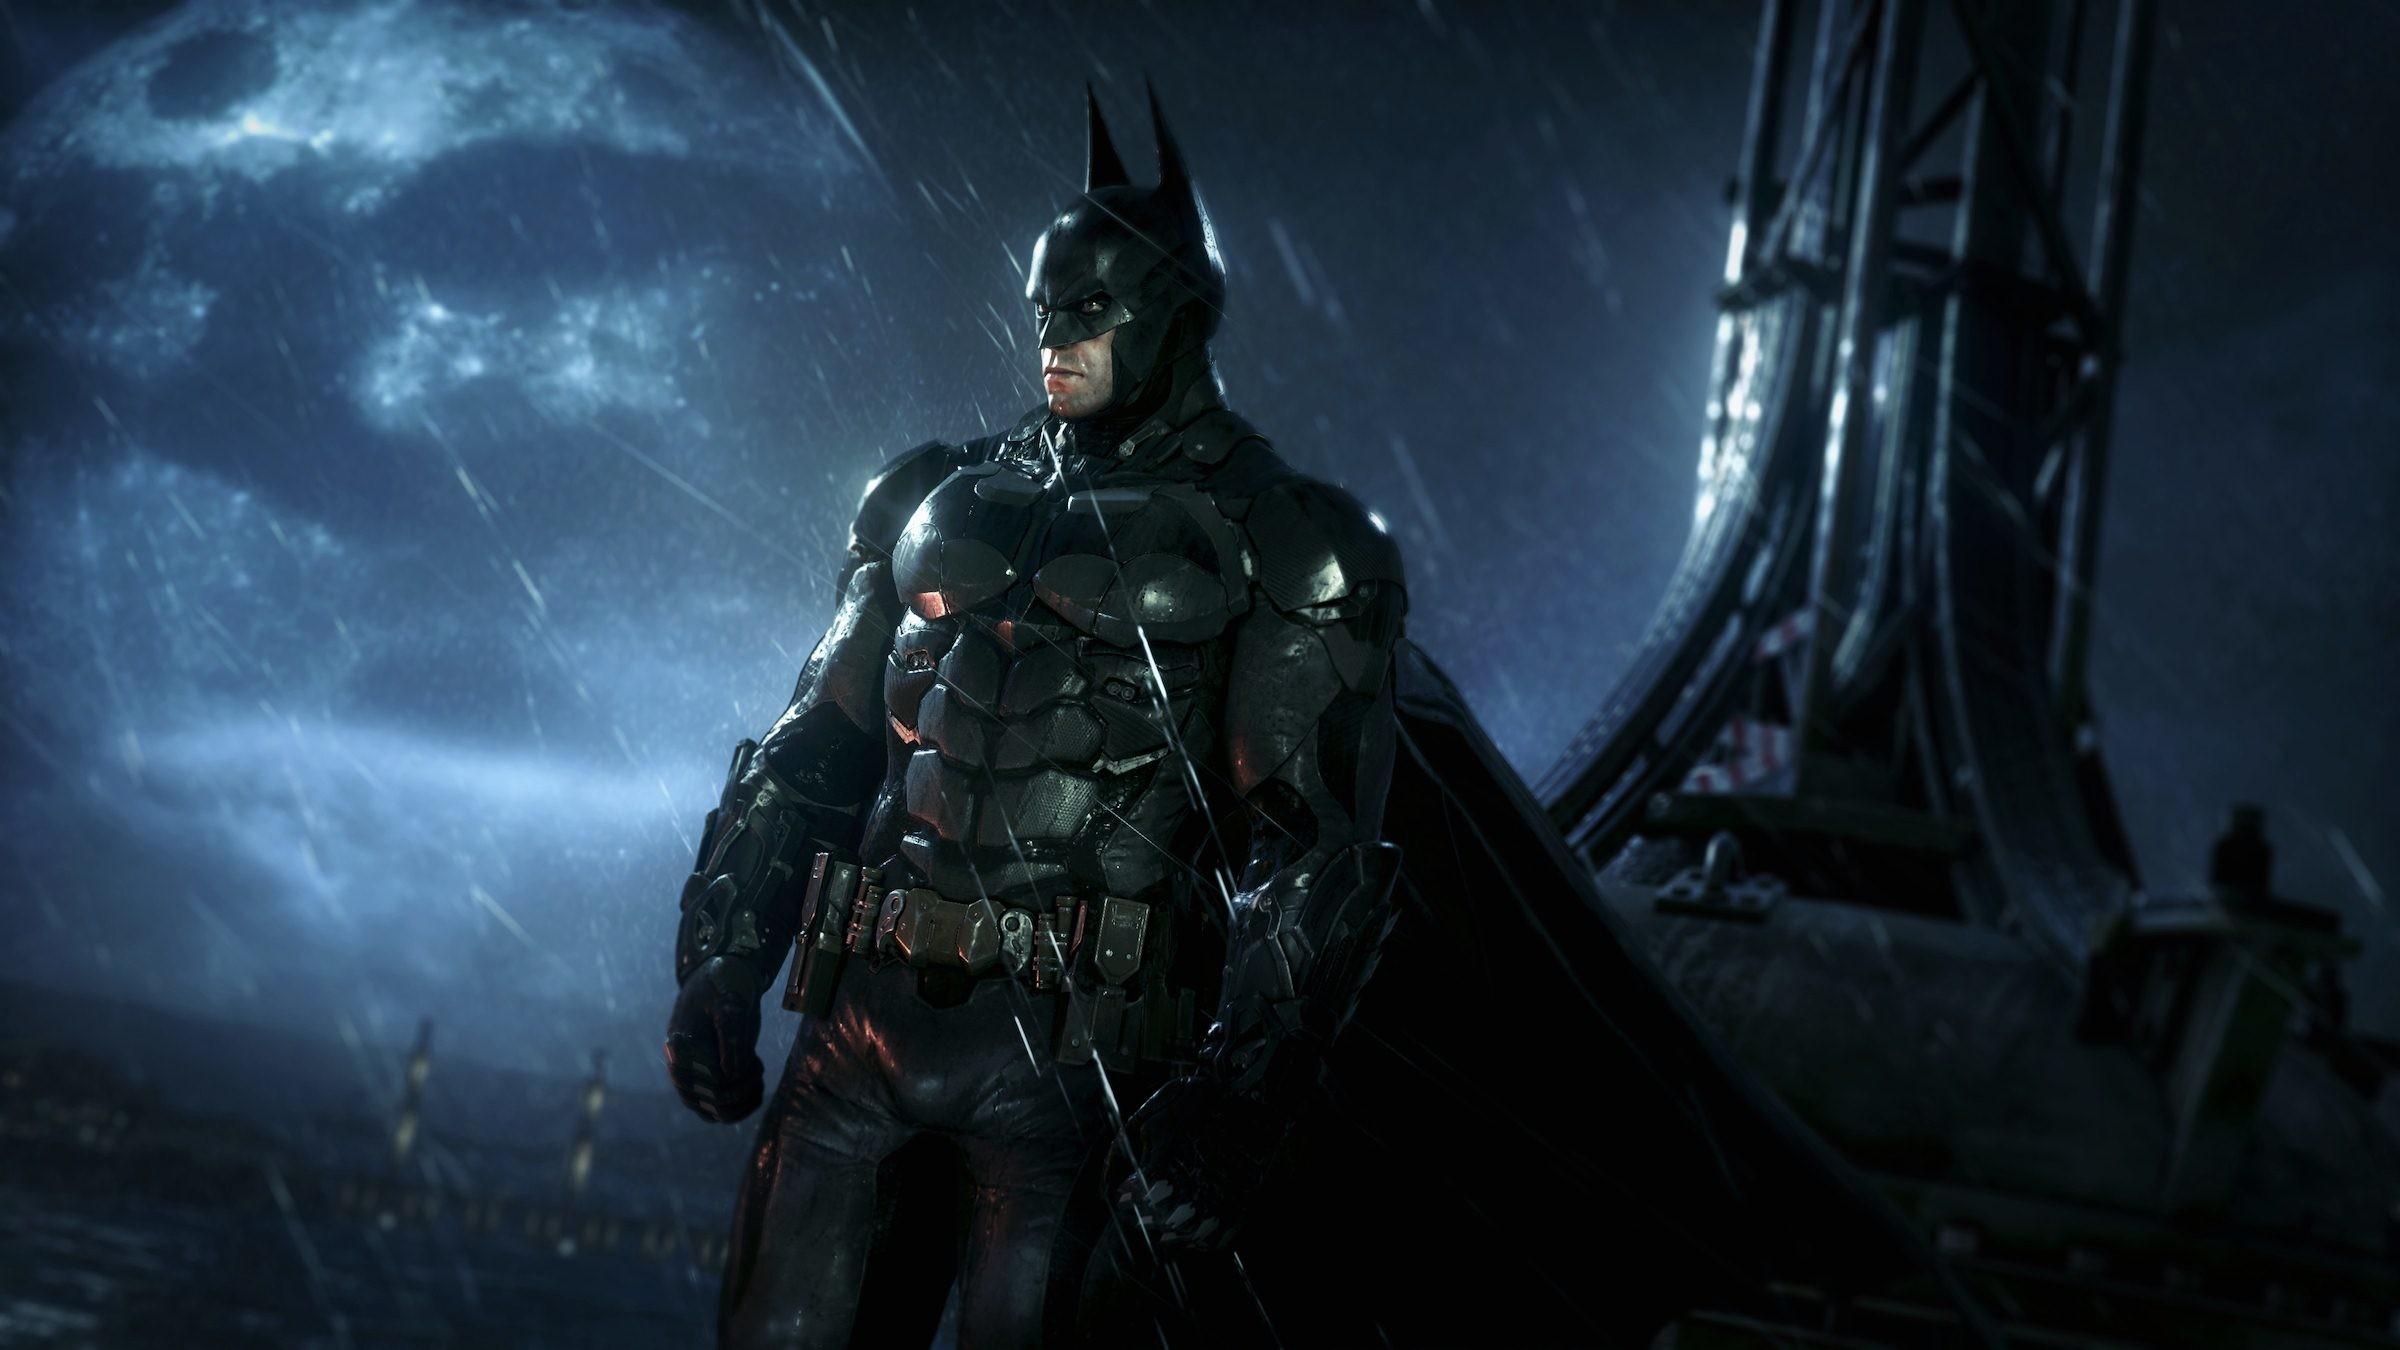 … Batman Arkham Knight HD wallpapers free download